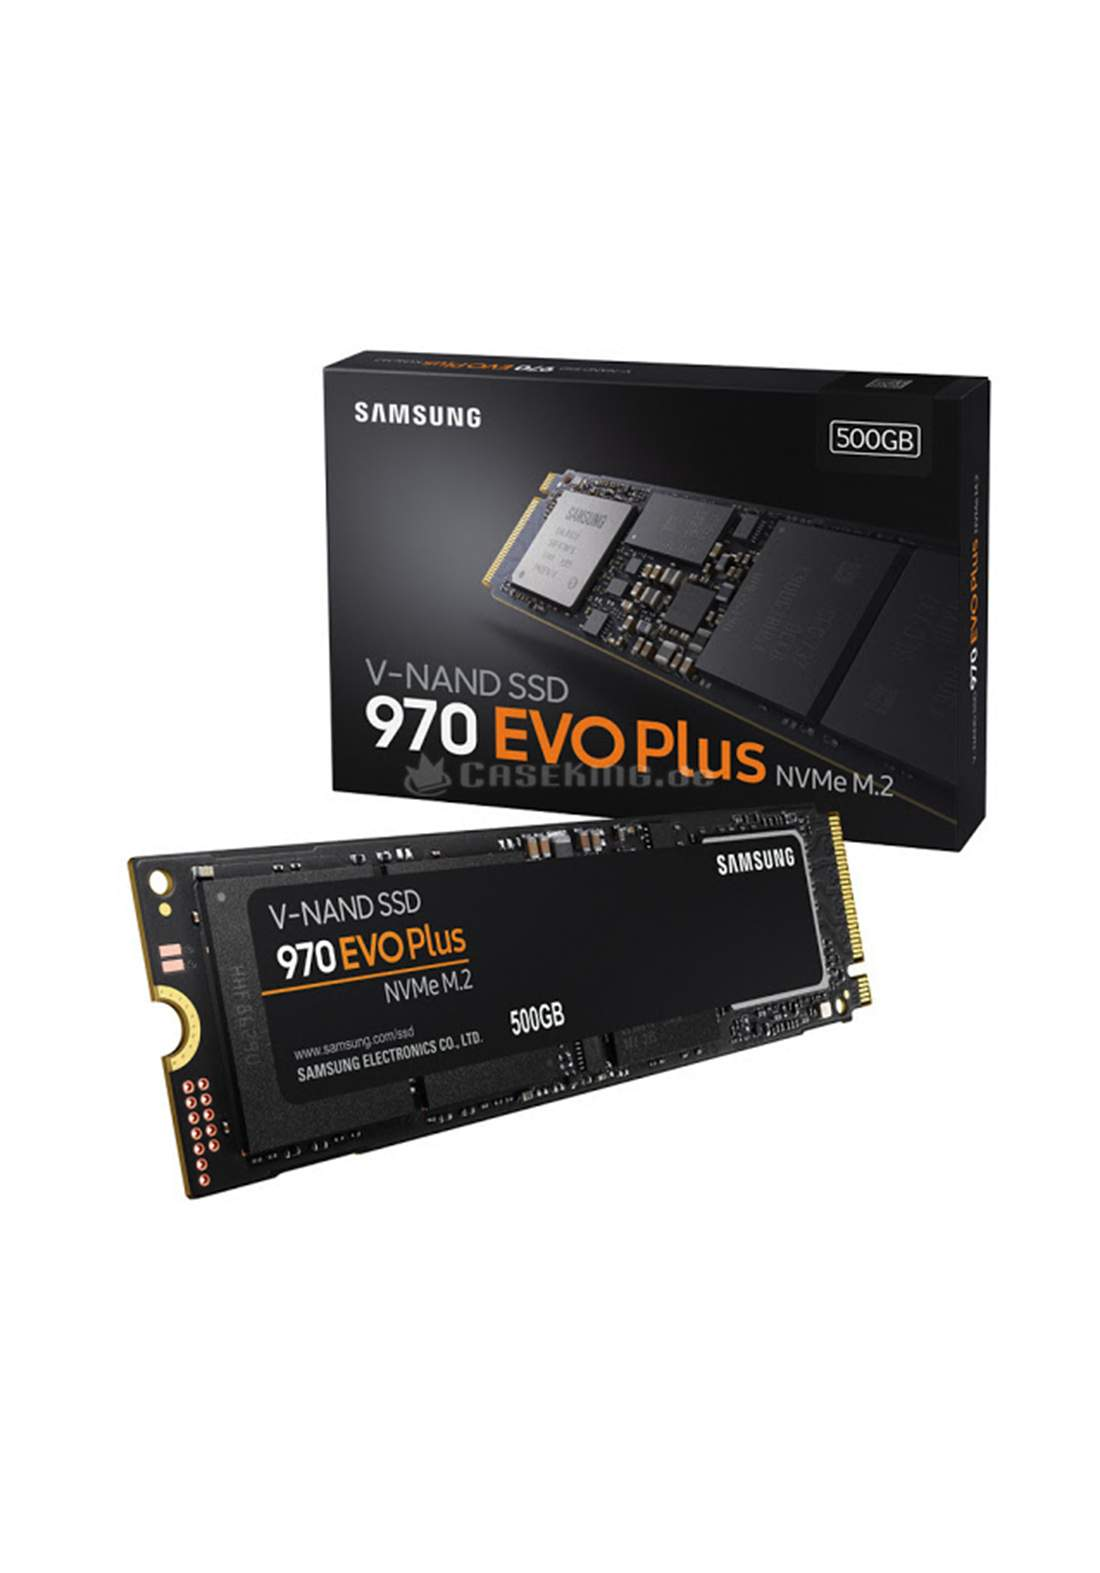 Samsung 500GB 970 EVO Plus NVMe M.2 Internal Solid State Drive